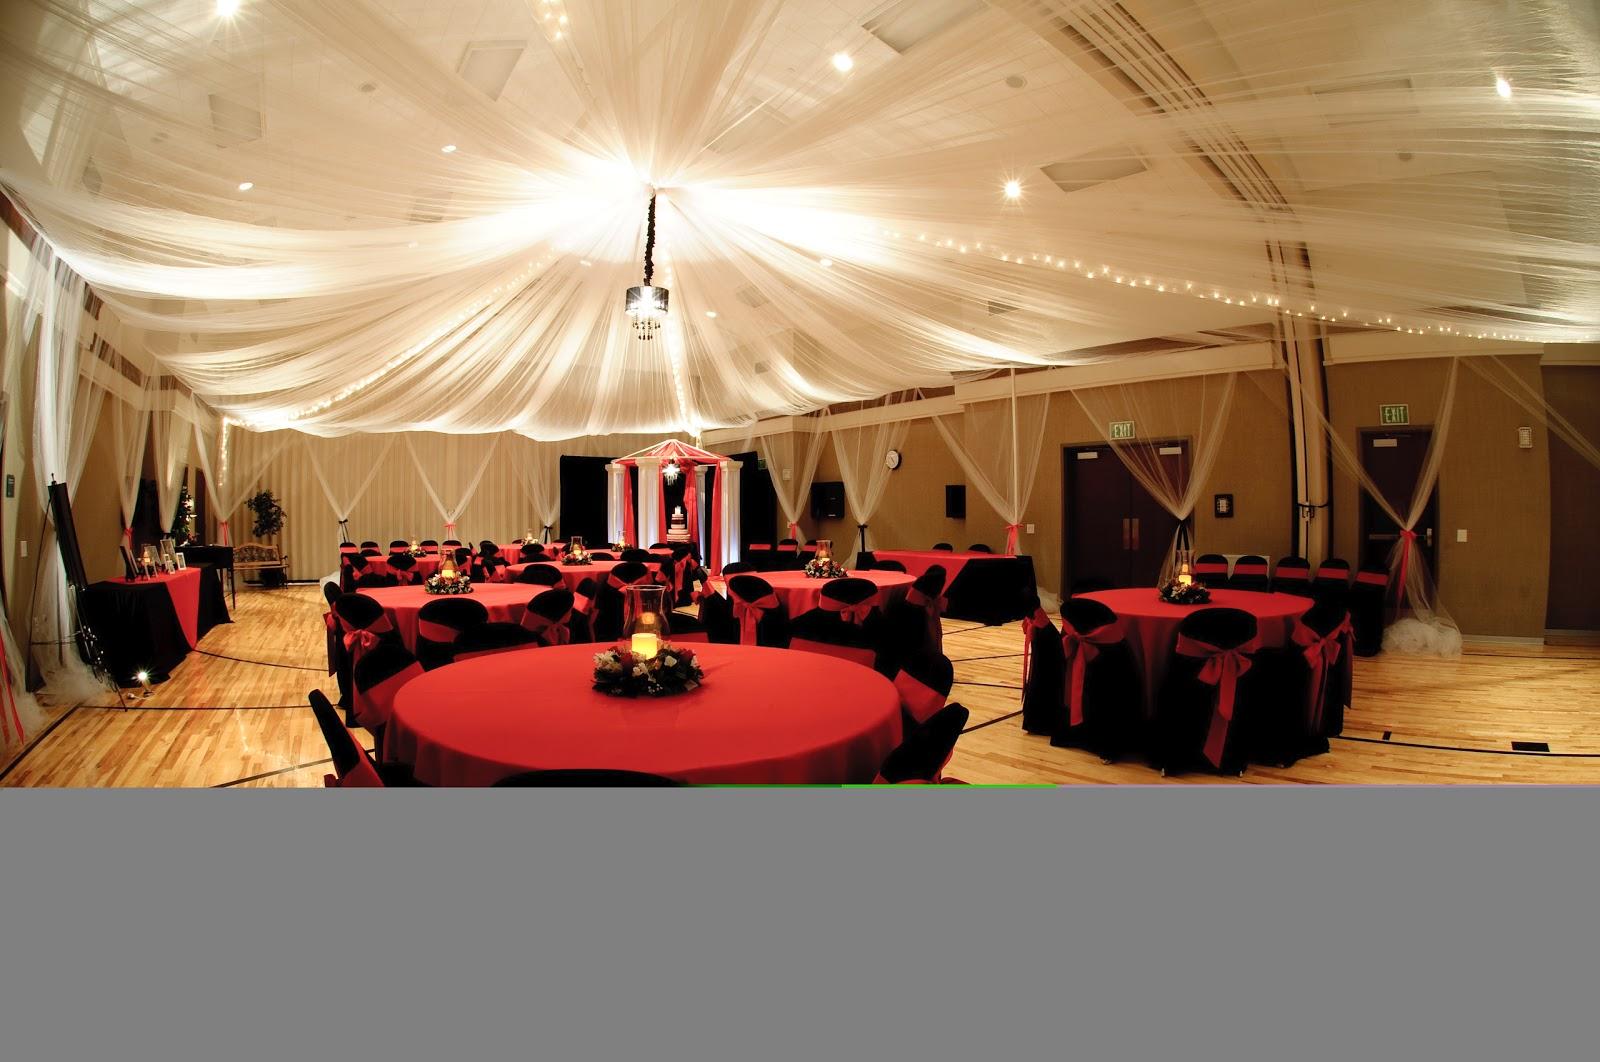 wedding decoration wedding decorating ideas tulle ceiling. Black Bedroom Furniture Sets. Home Design Ideas